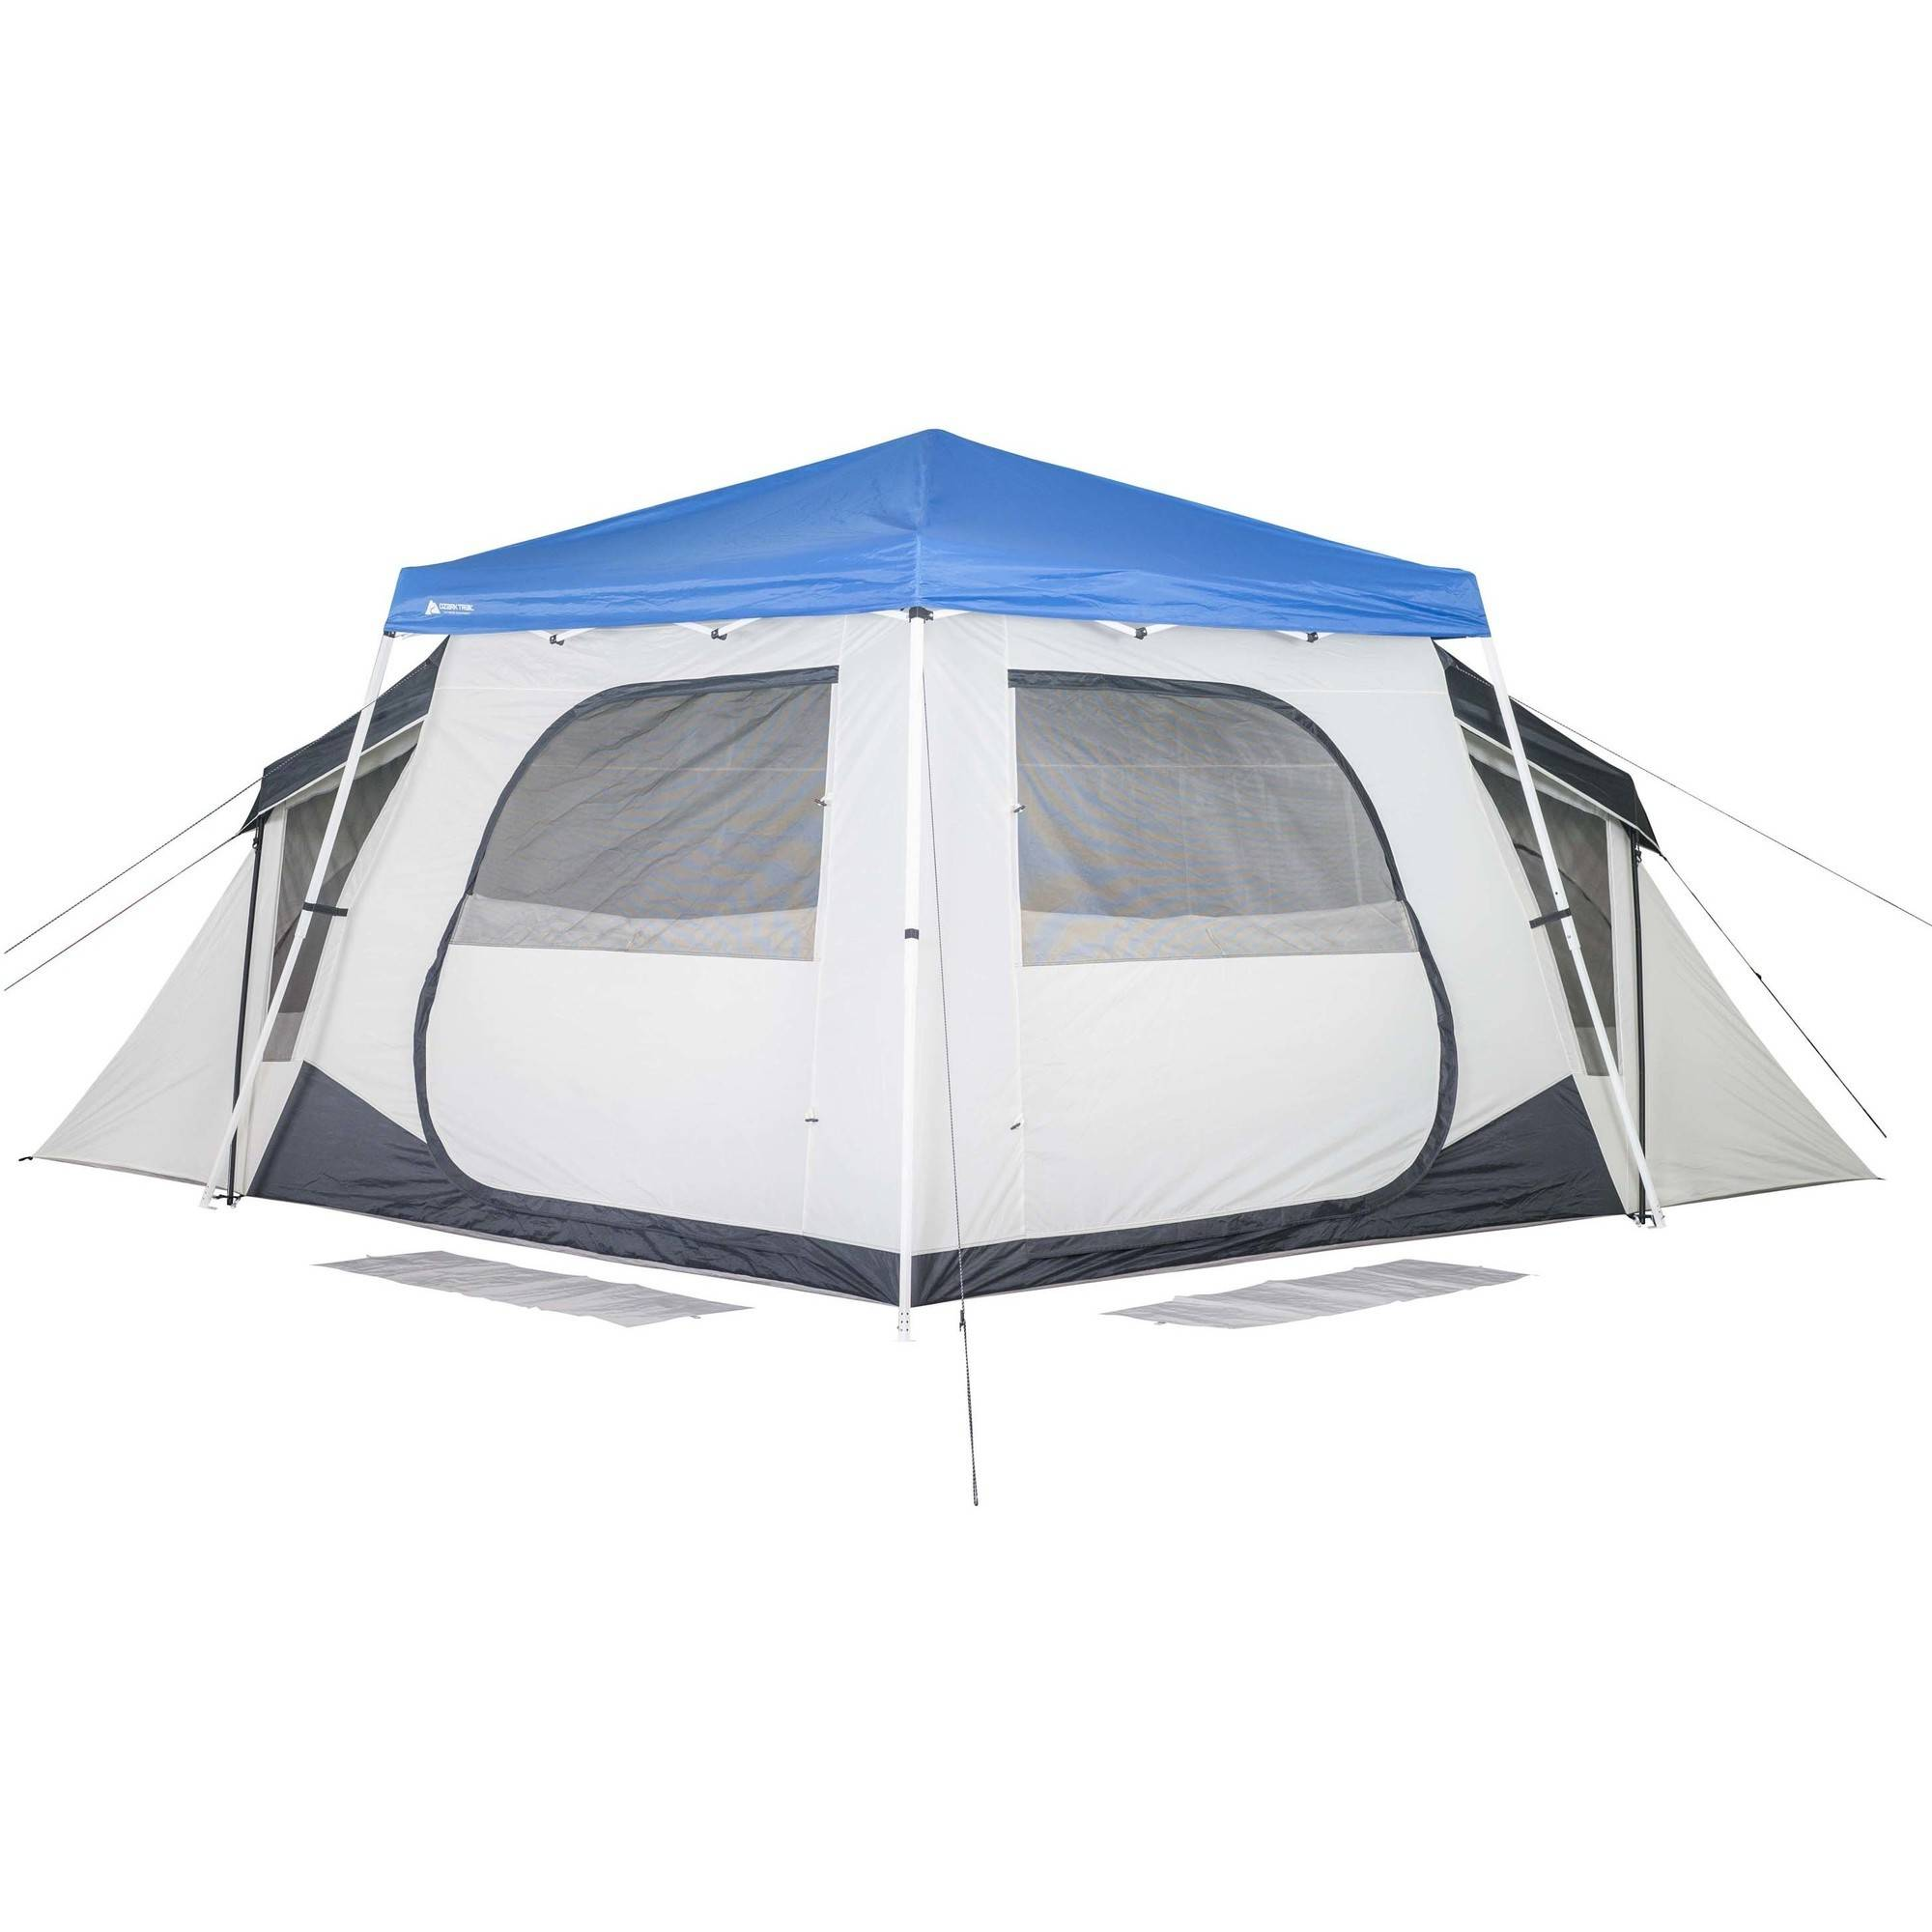 Ozark Trail 14-Person ConnecTent Canopy Tent